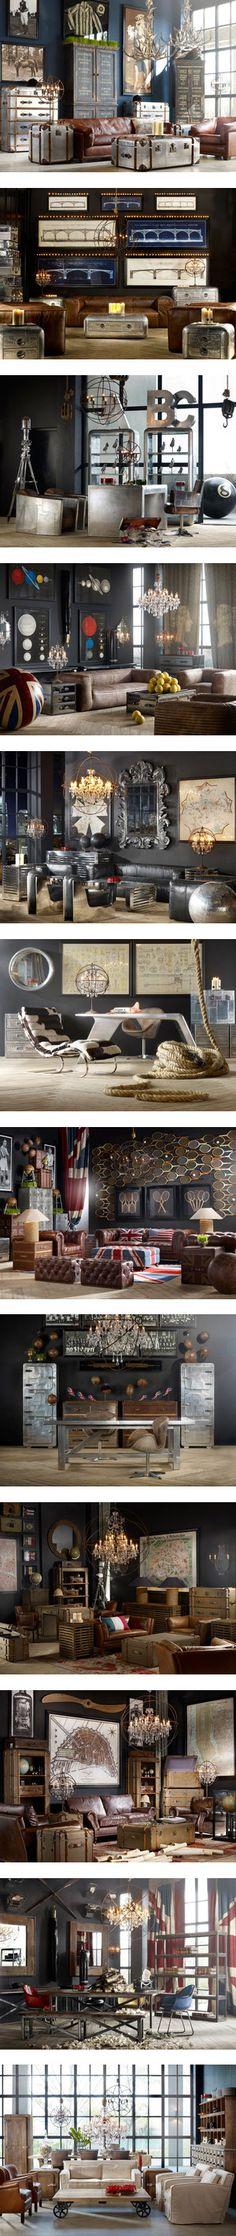 """Timothy Oulton U.K. Designer Extraordinaire"" by inspirestylevtg on Polyvore"